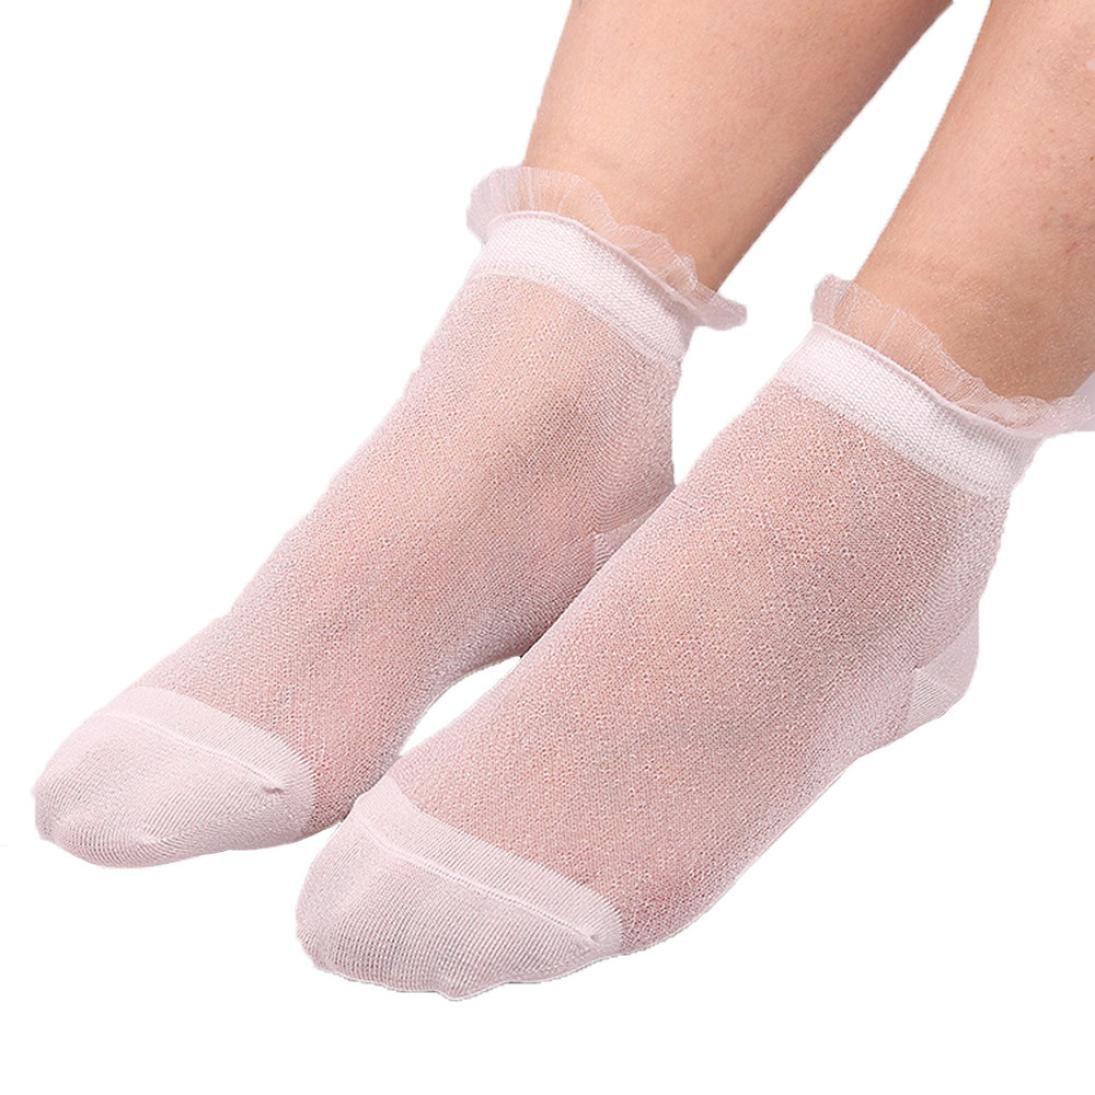 Amiley Hot Sale Summer Women Ladies Sheer Silky Glitter Transparent Short Stockings Ankle Socks